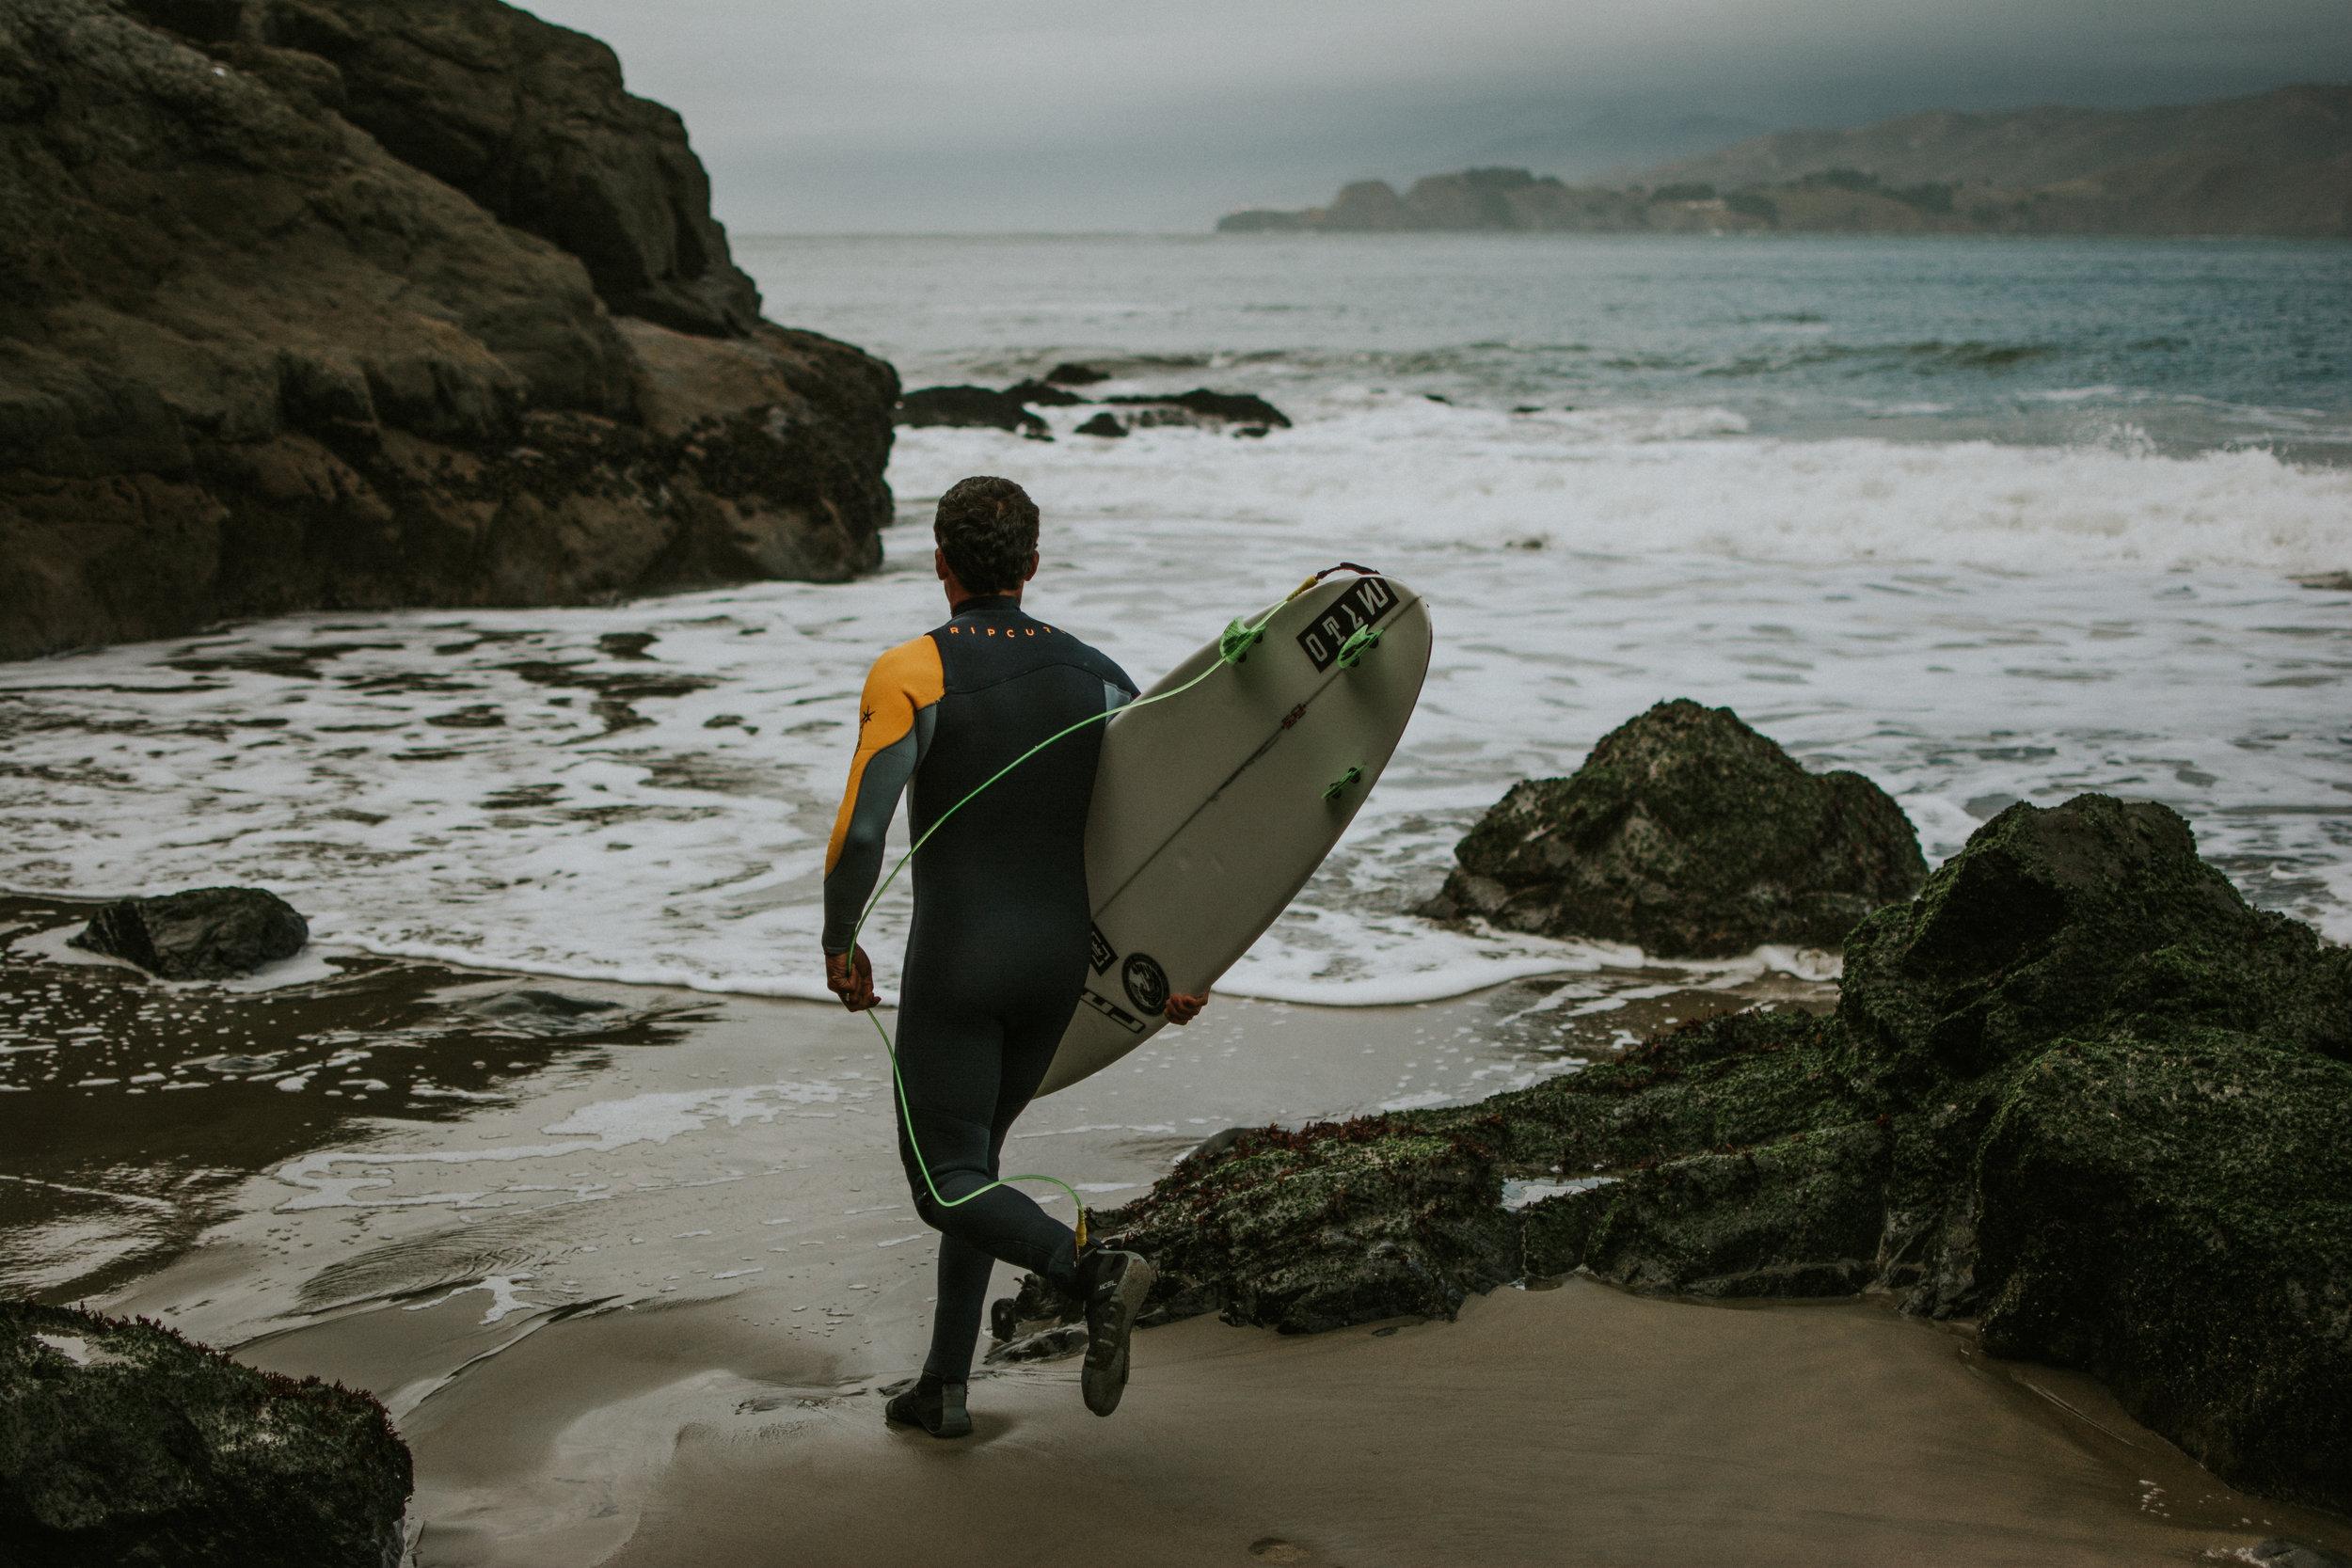 san-francisco-travel-photographer-erika-ryan-photography-china-beach-surfer